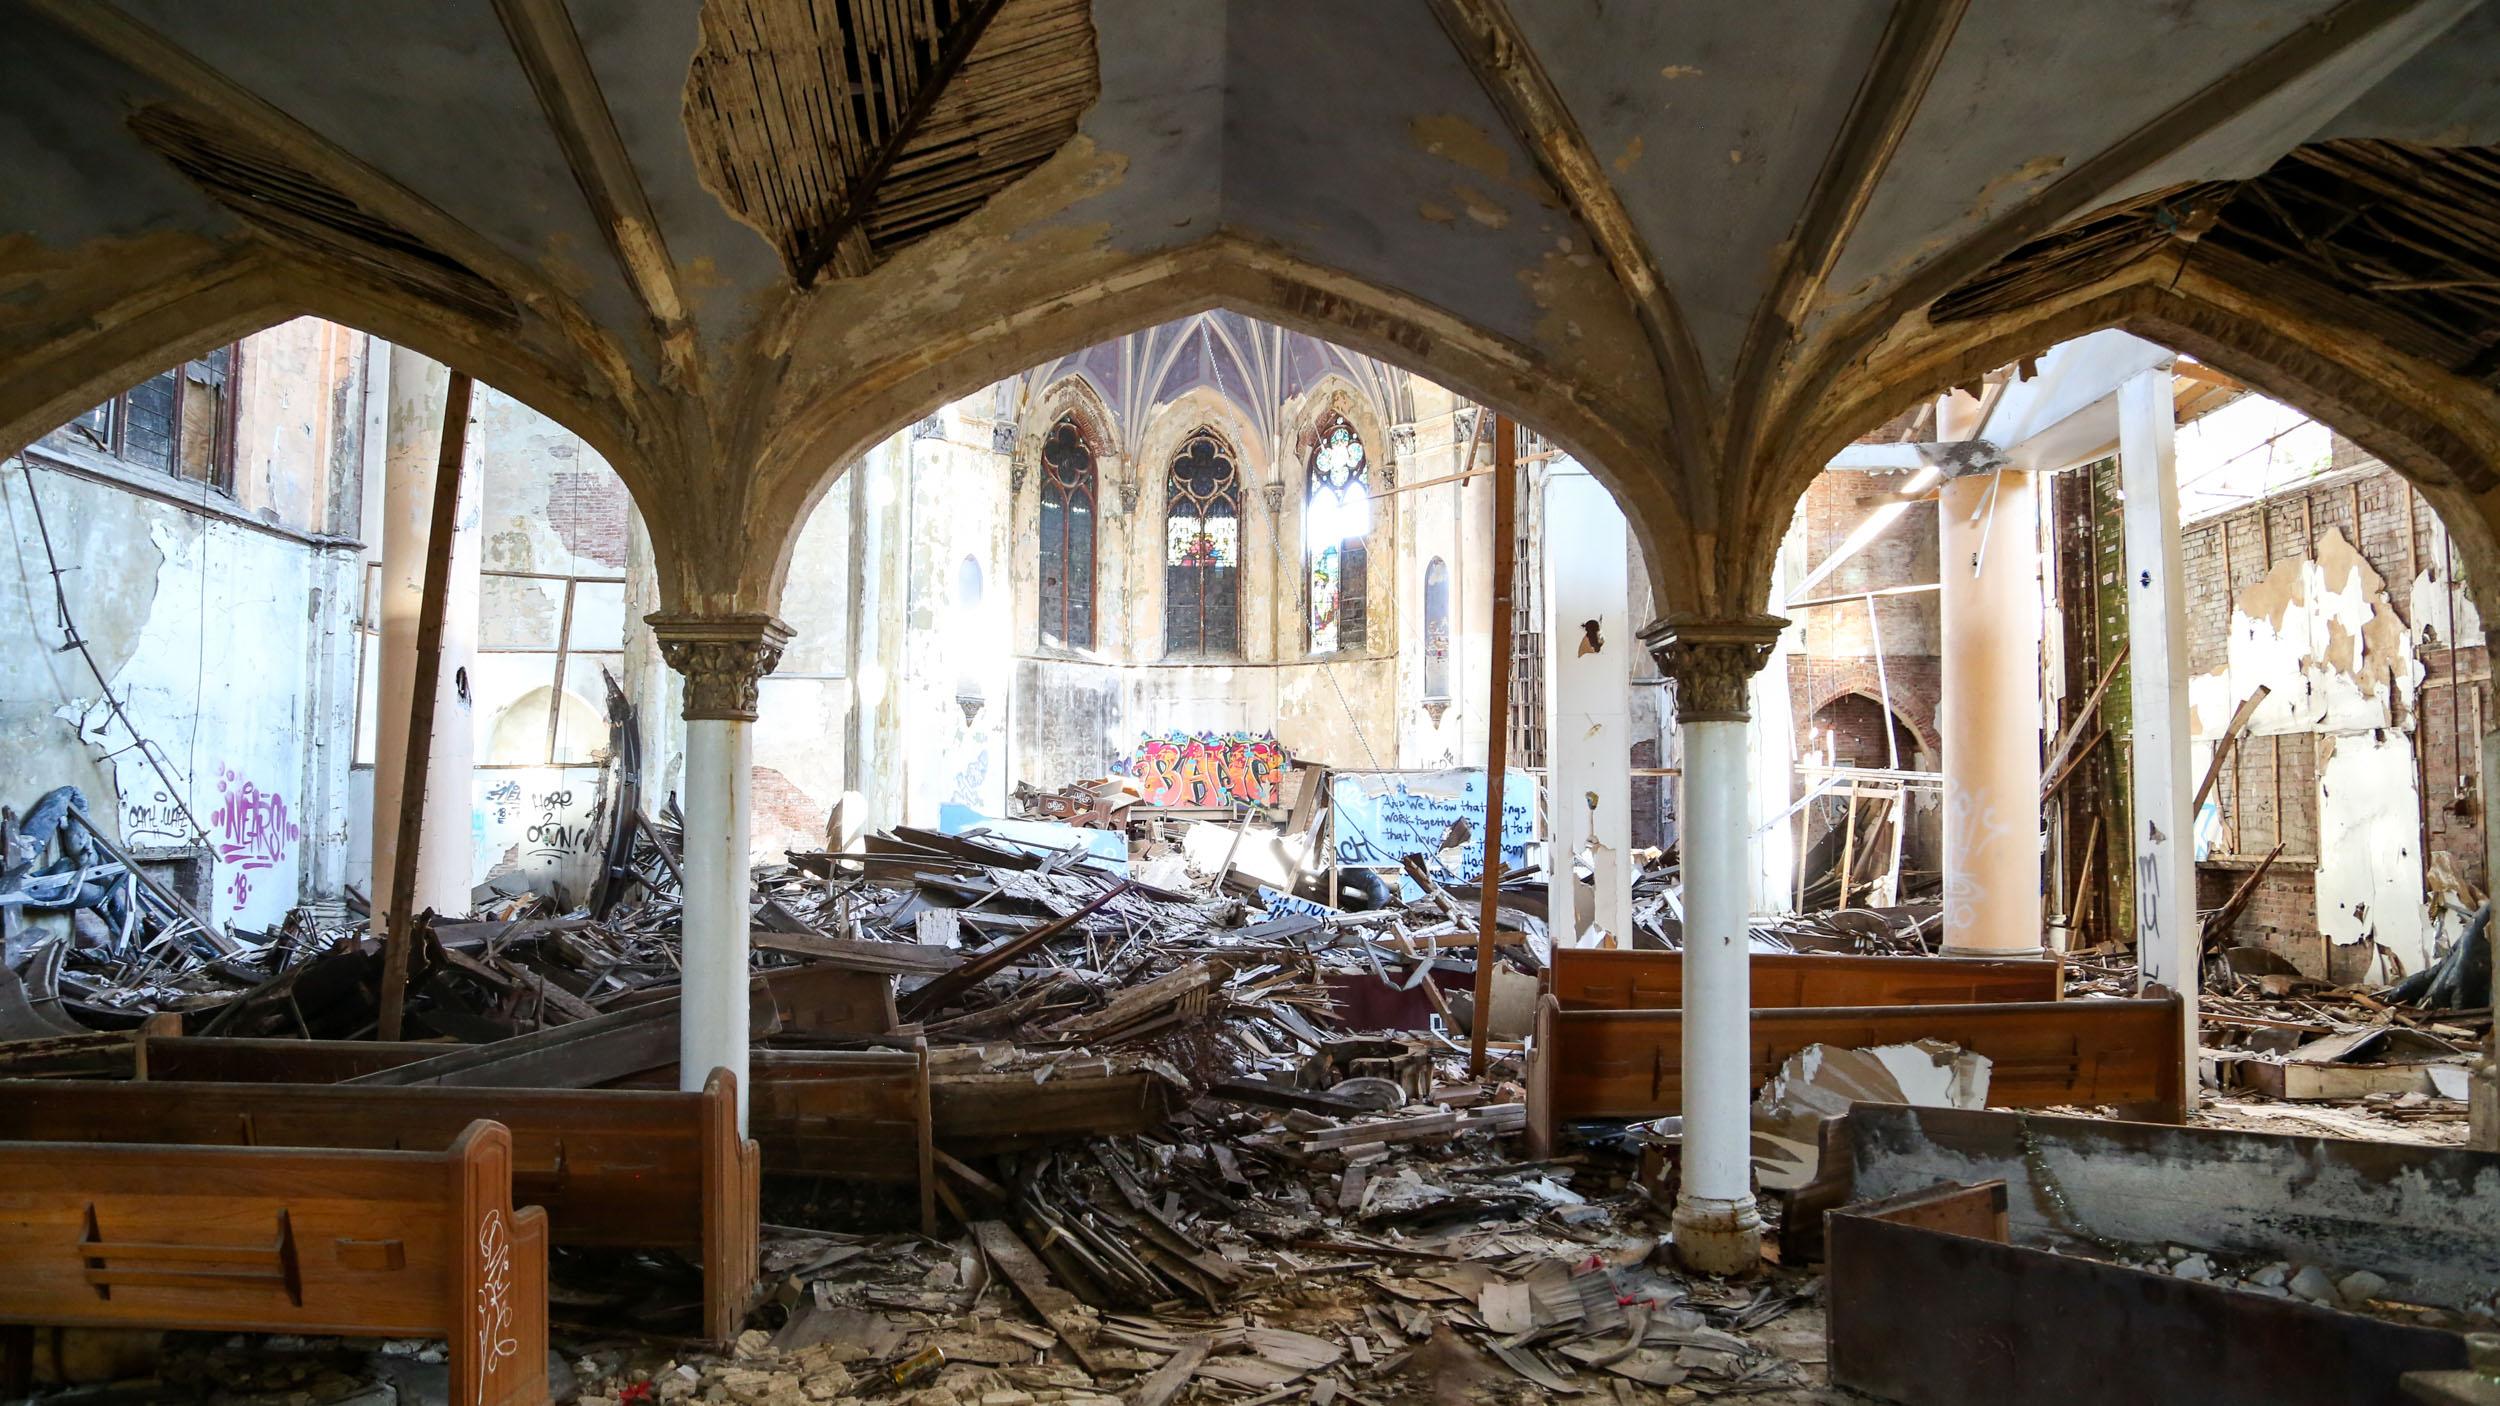 St. Augustine's Roman Catholic Church – Part 2: A Look Inside